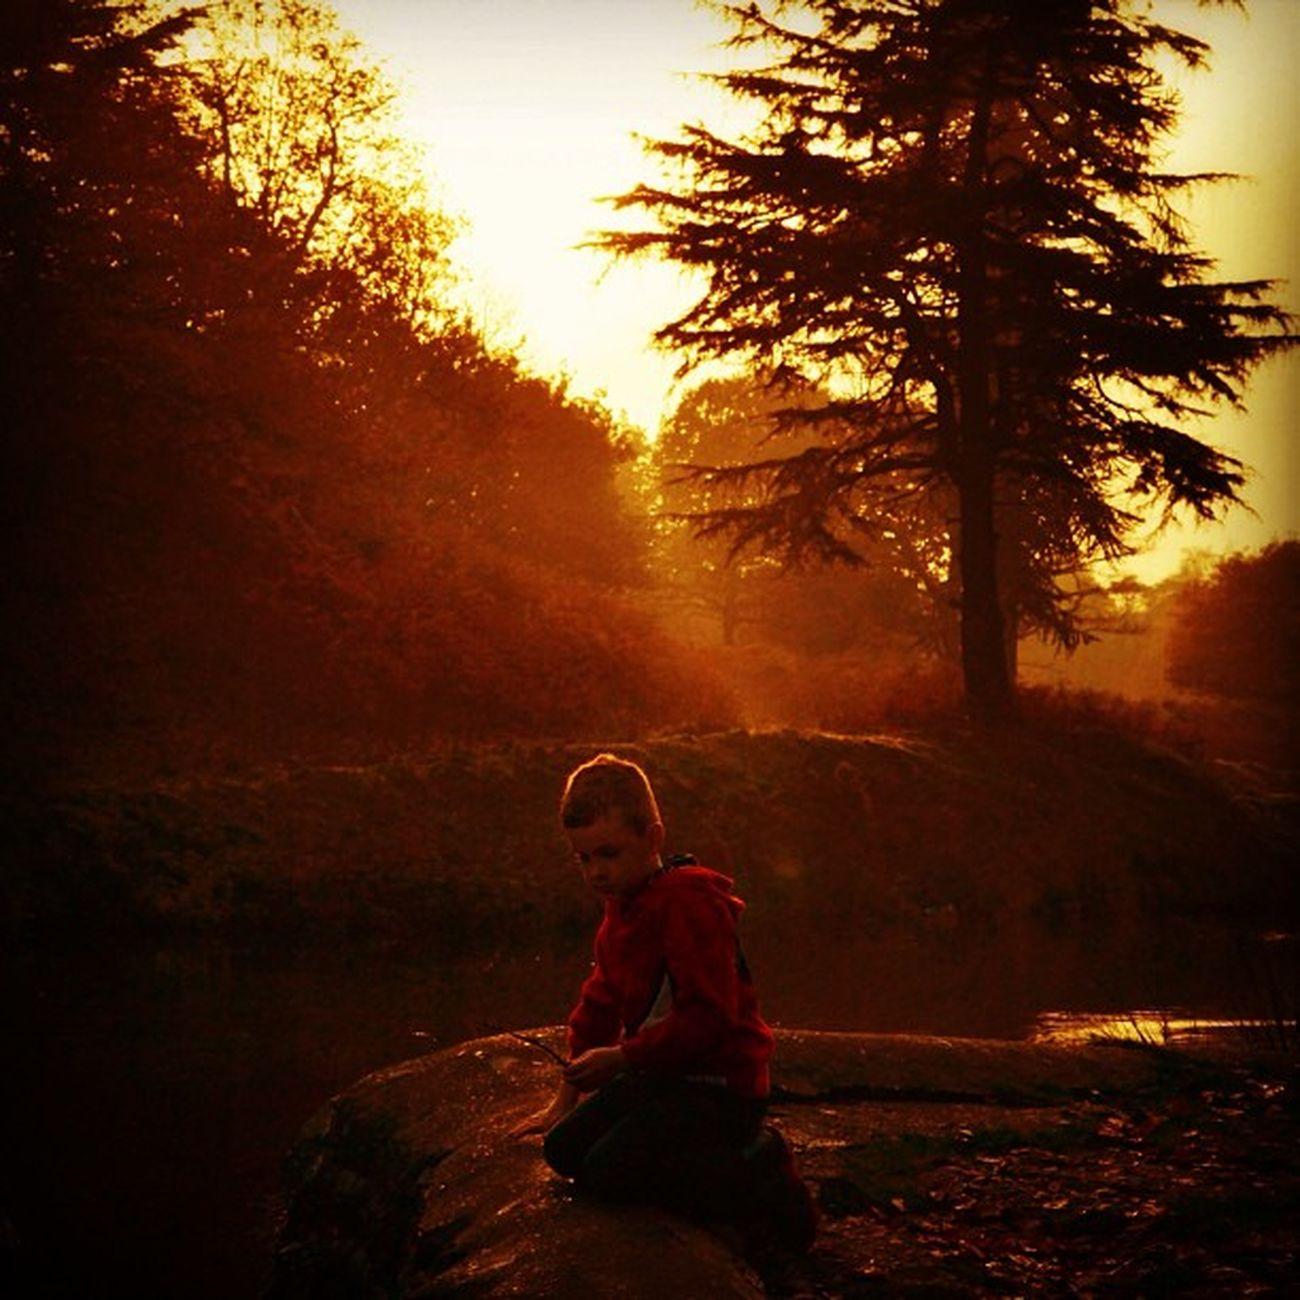 Boy. Bradgatepark Sunset Igsunset Instasunset iphonography nature instanature photo park